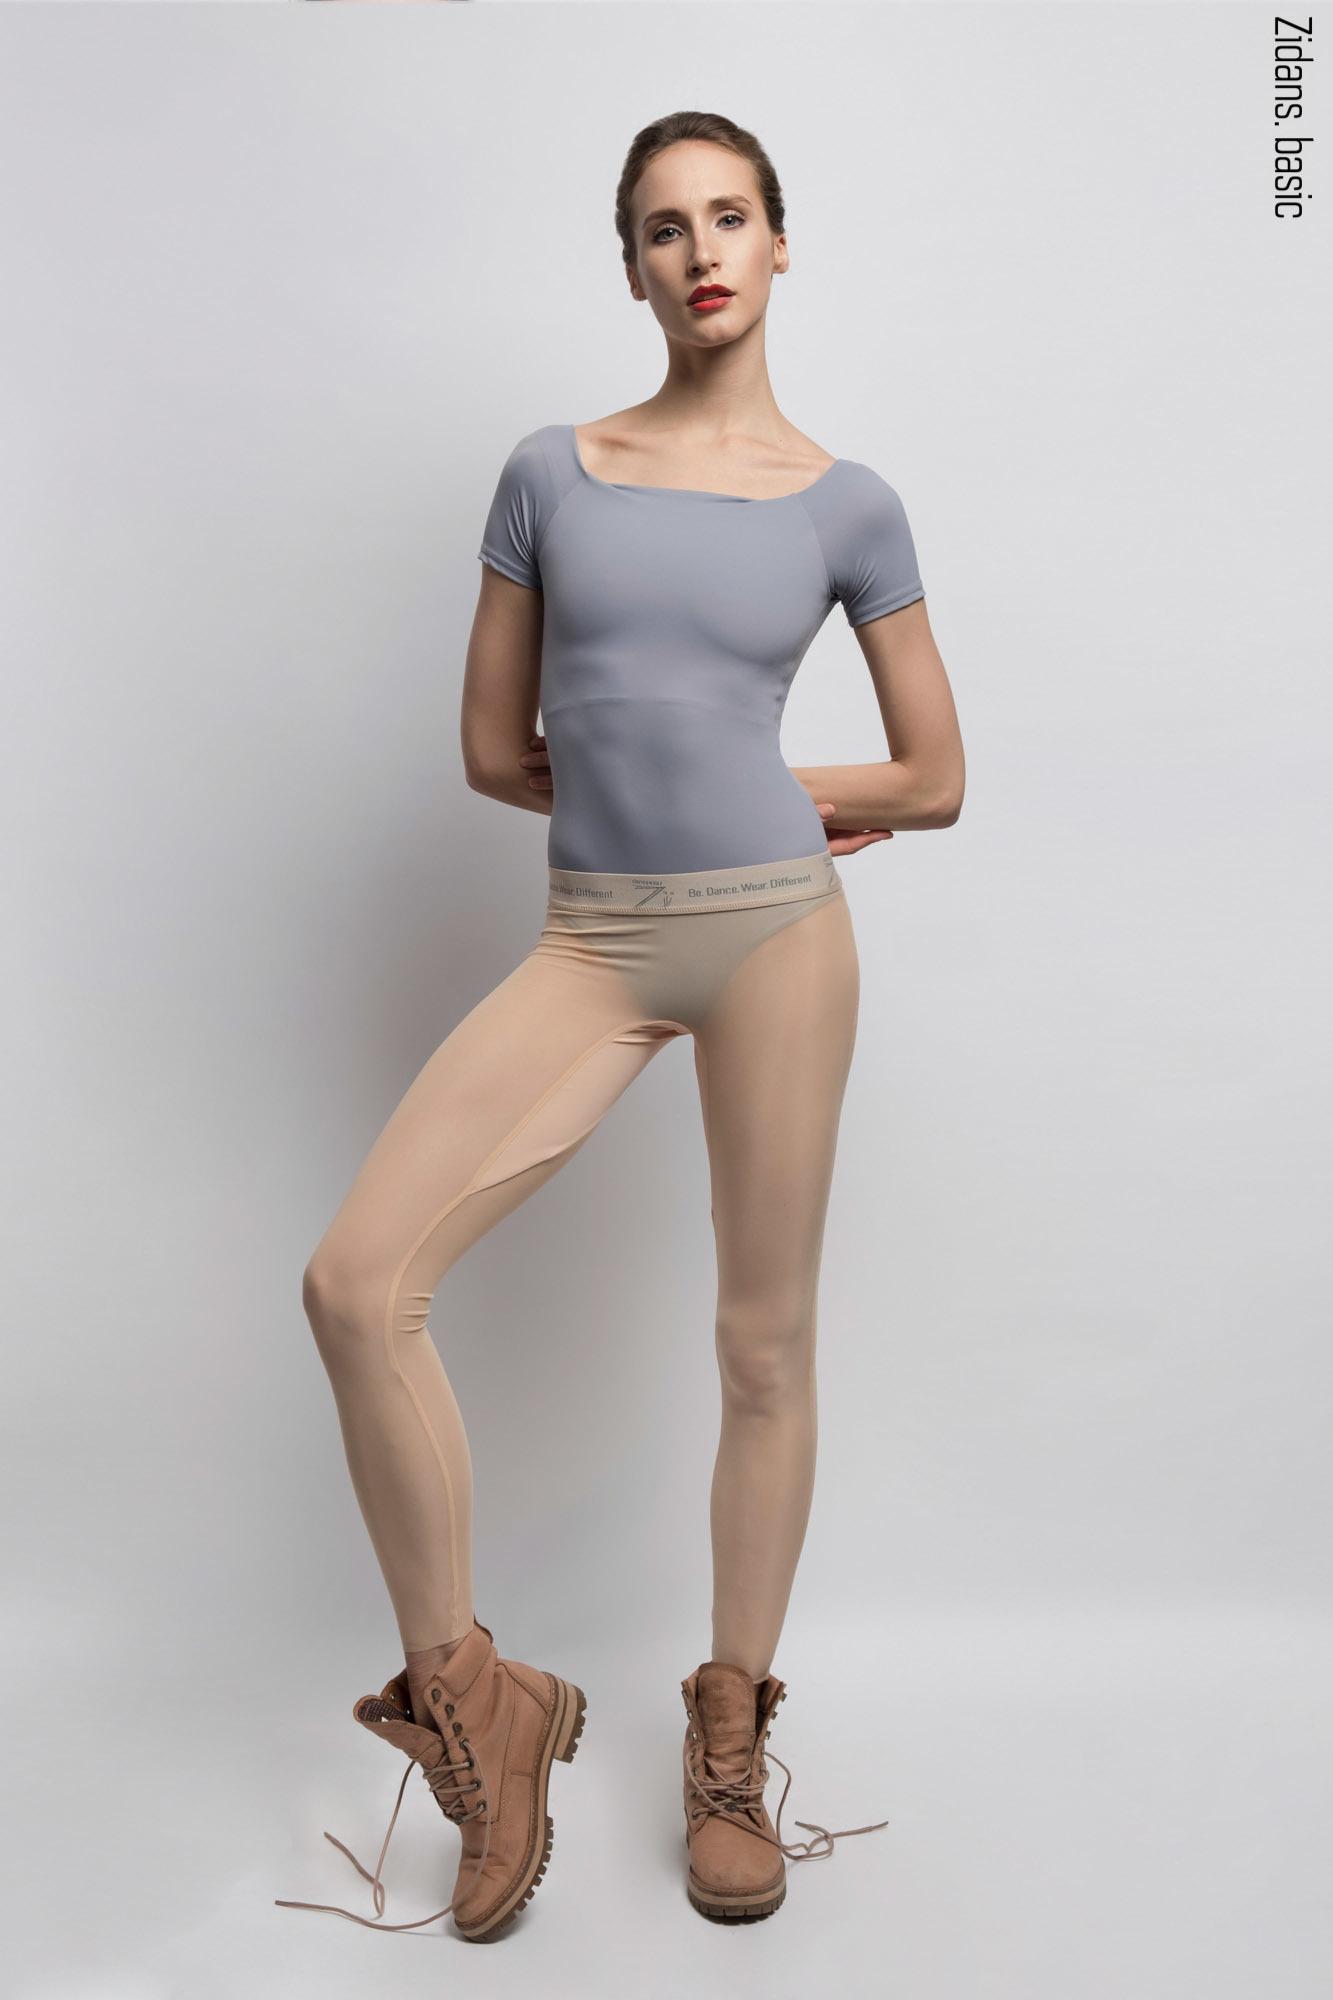 Translucent Ziphirus leggings Zold | nude